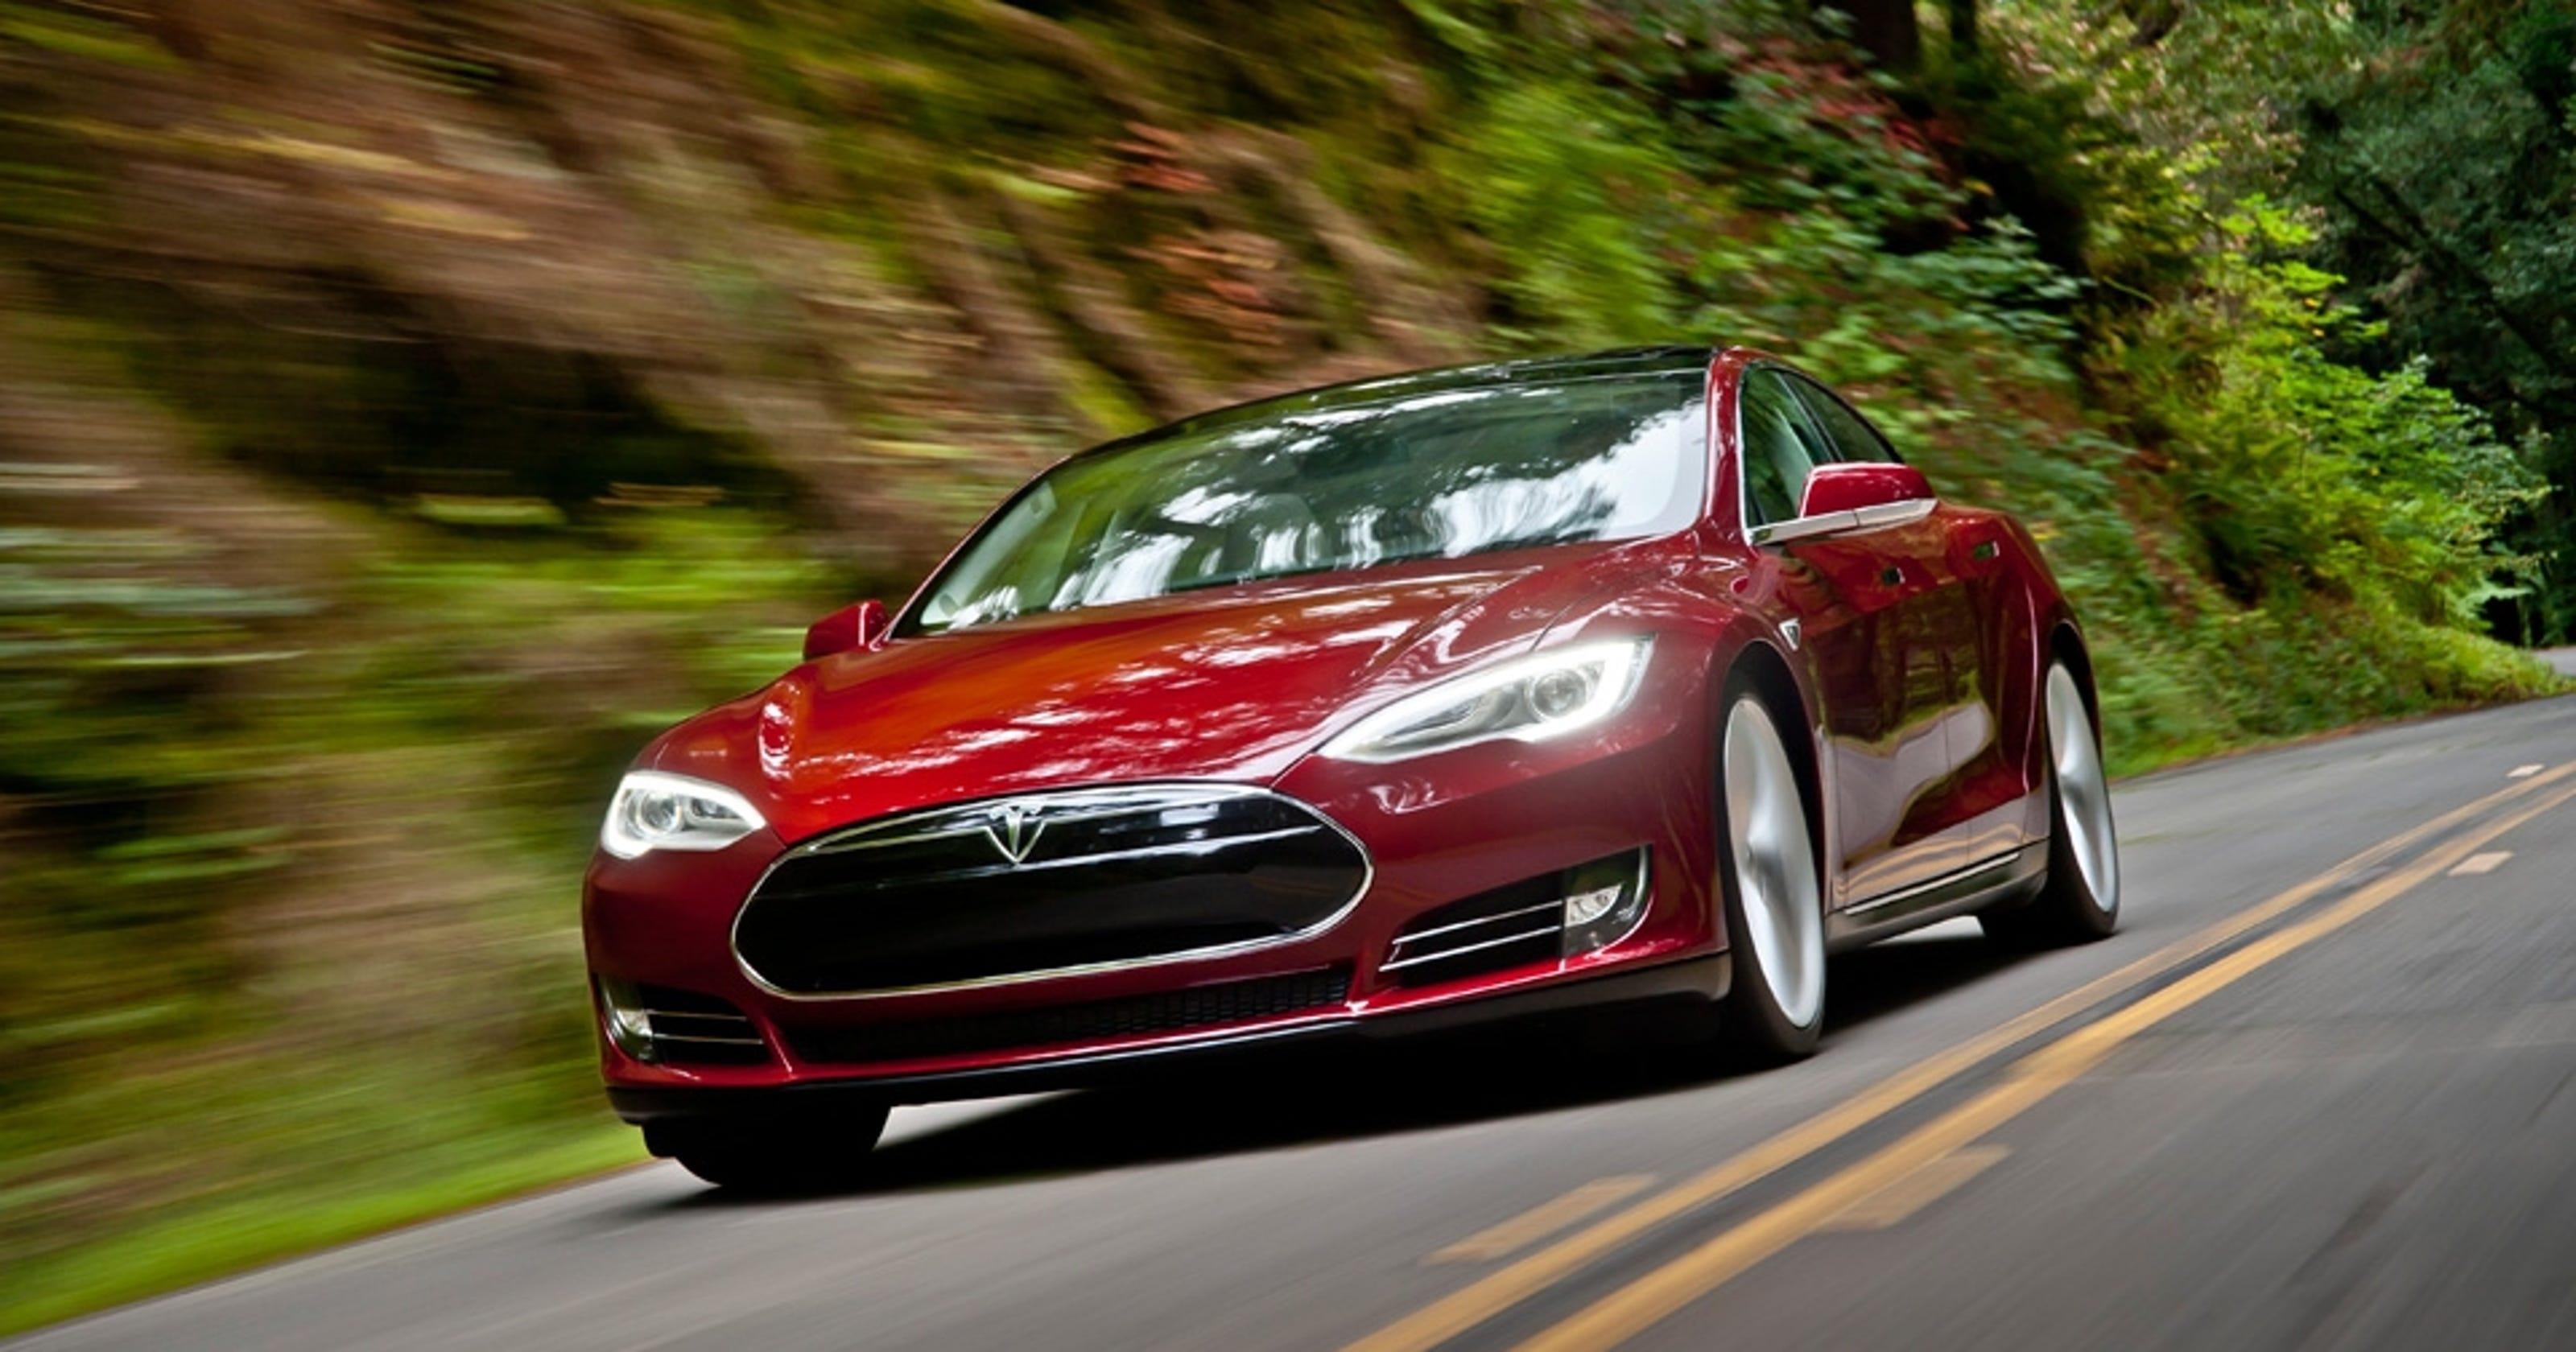 Iowa Curbs Tesla Test Drives